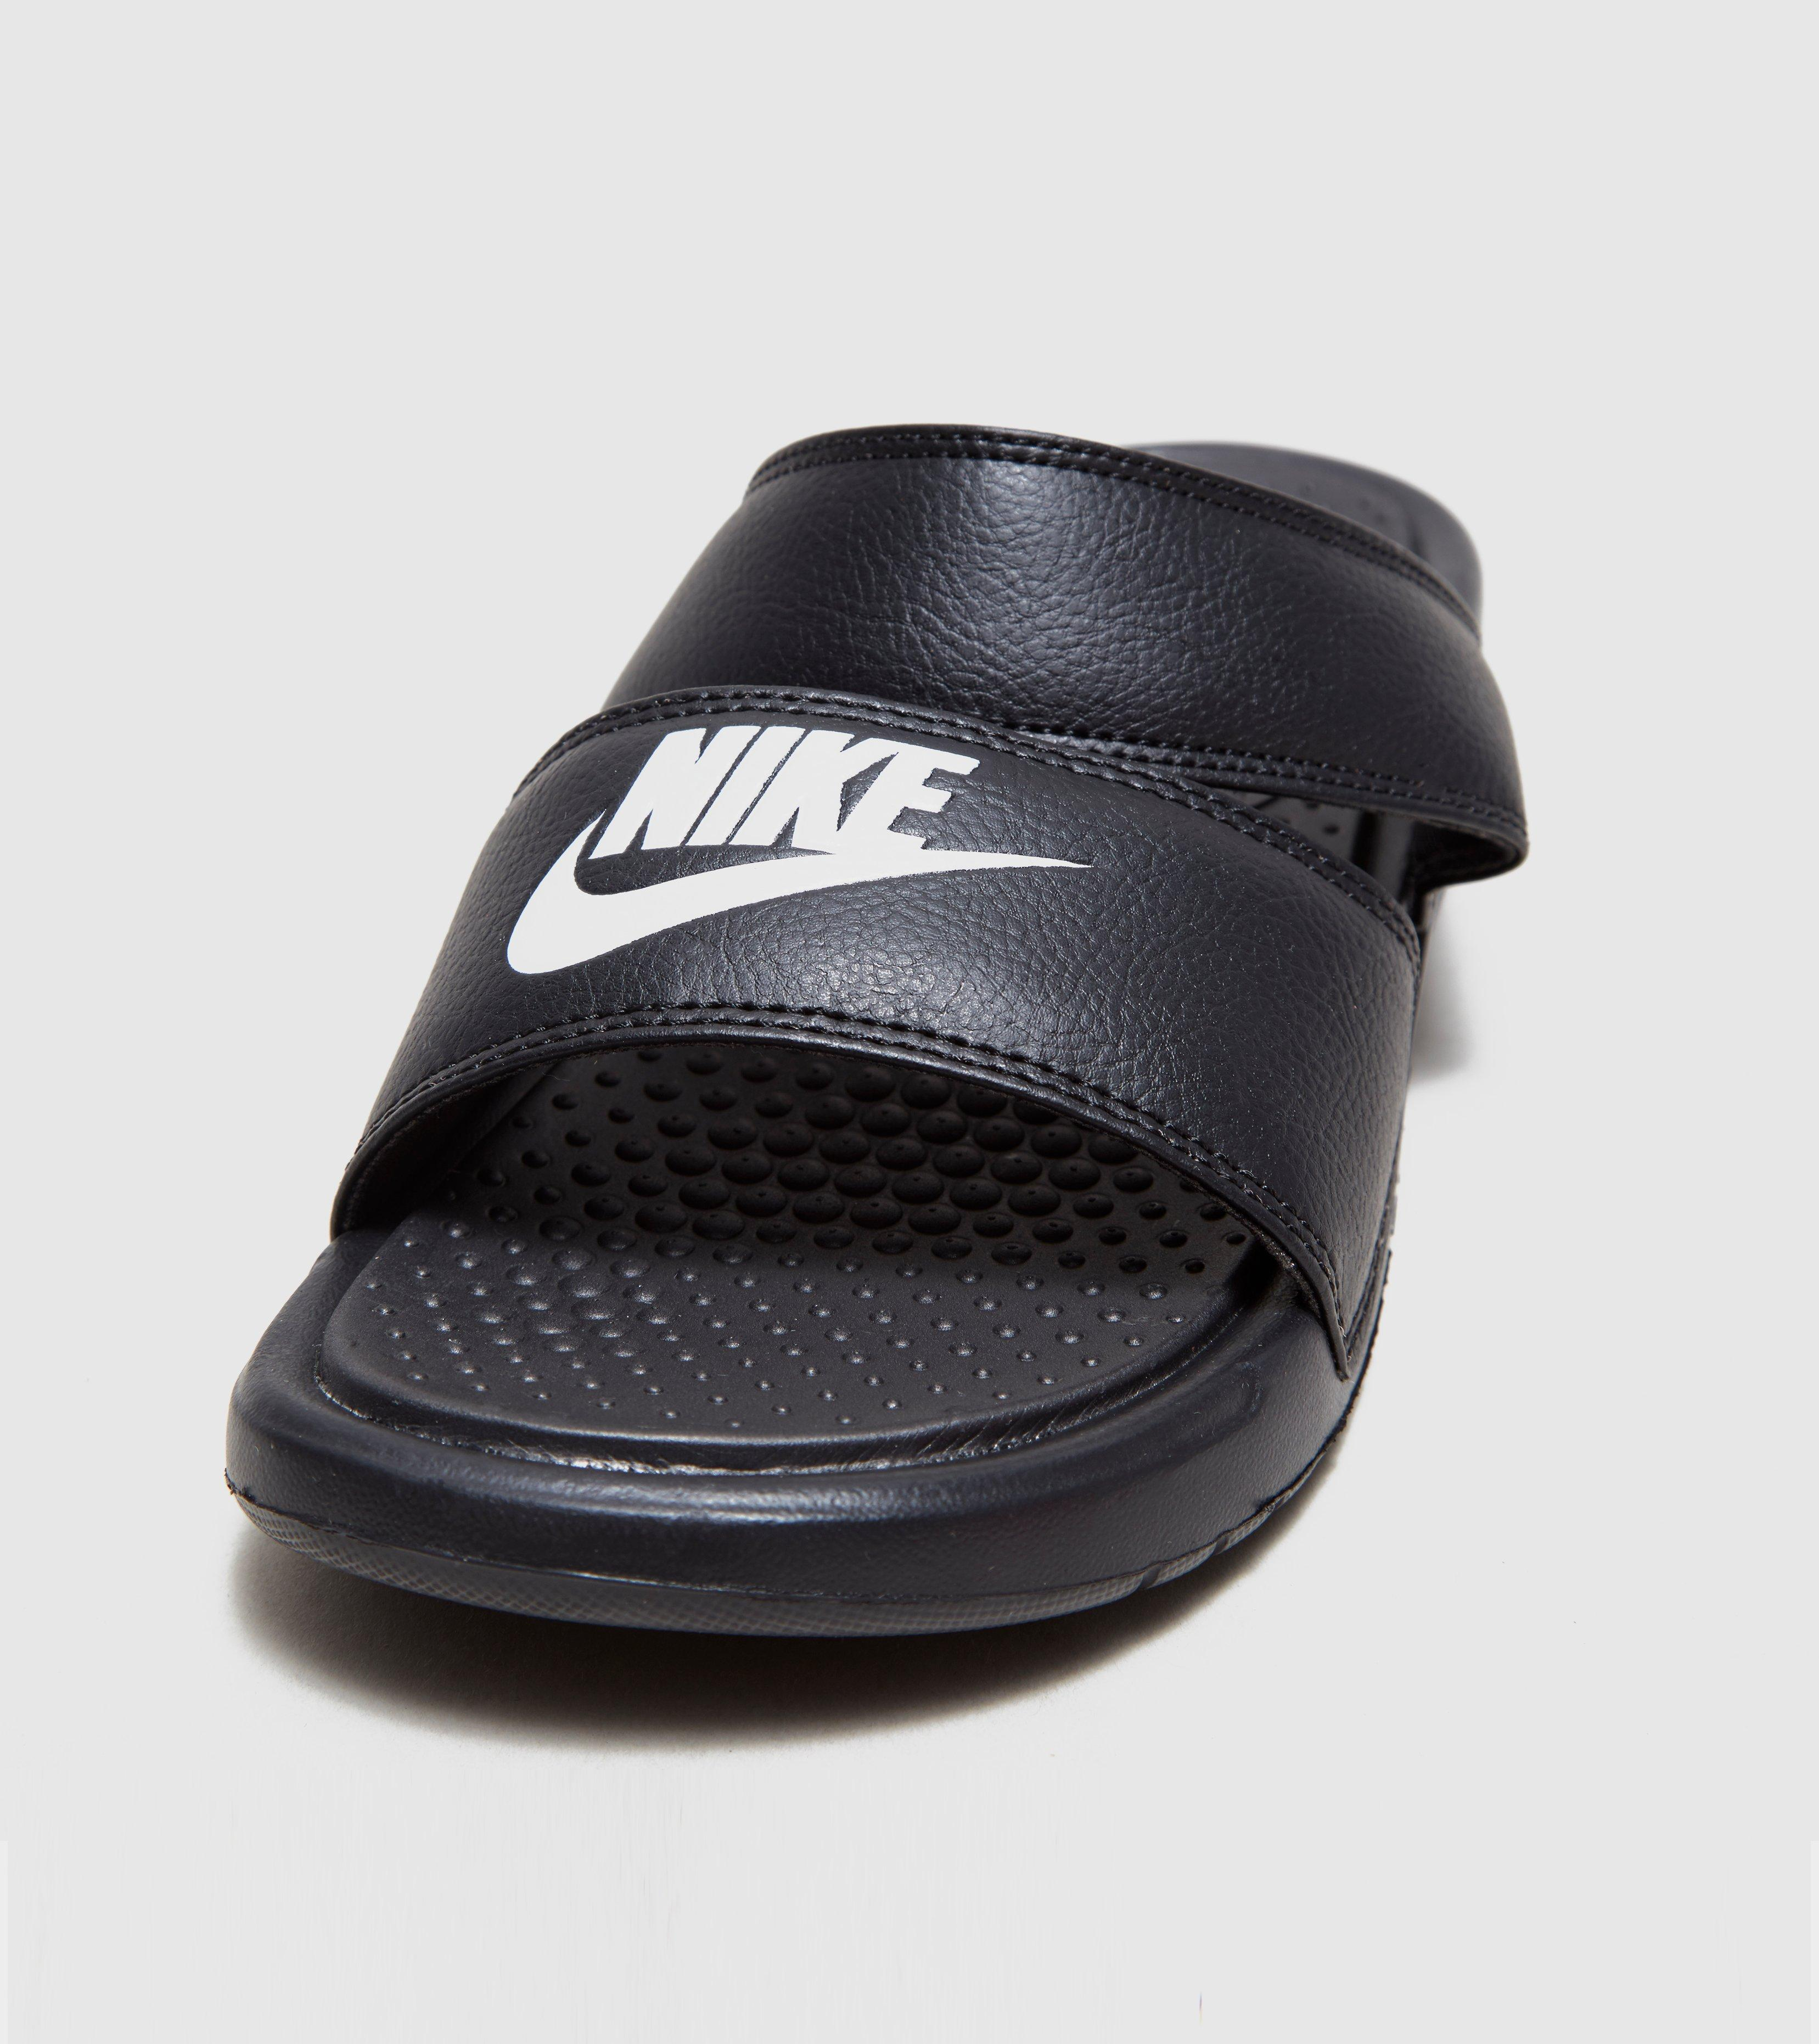 black s slides womens nike comforter comfort women ultra shoes thong blackblack duo benassi in men for lyst gallery